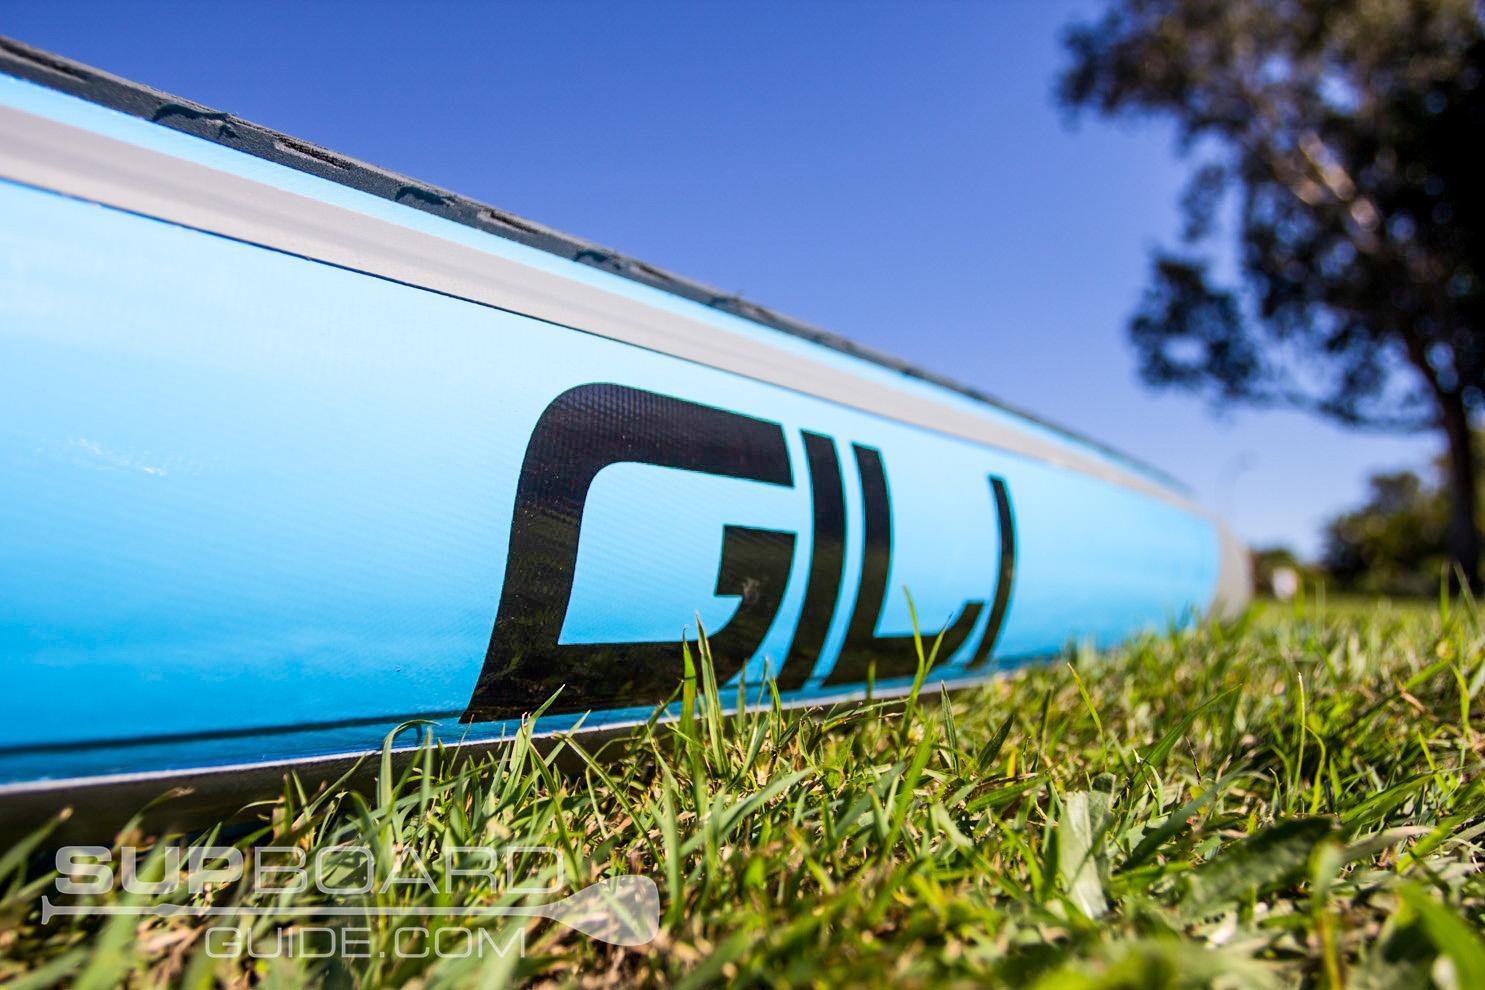 Gili Logo Design